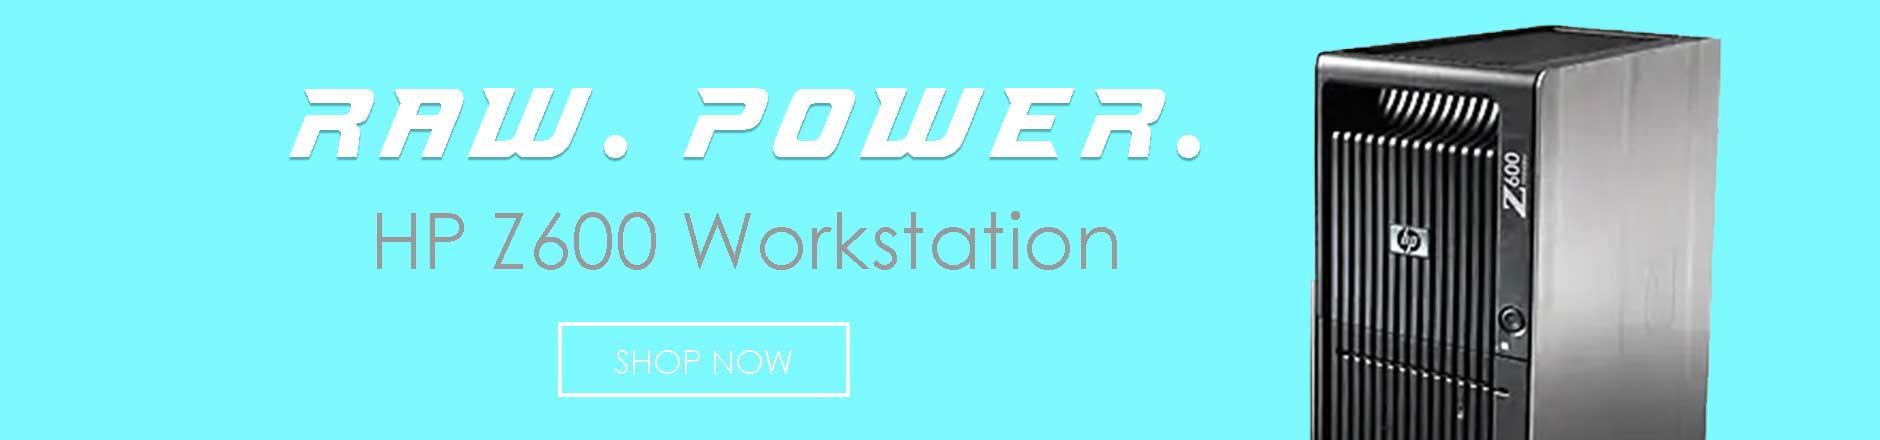 HP Z600 Workstation On Sale Now